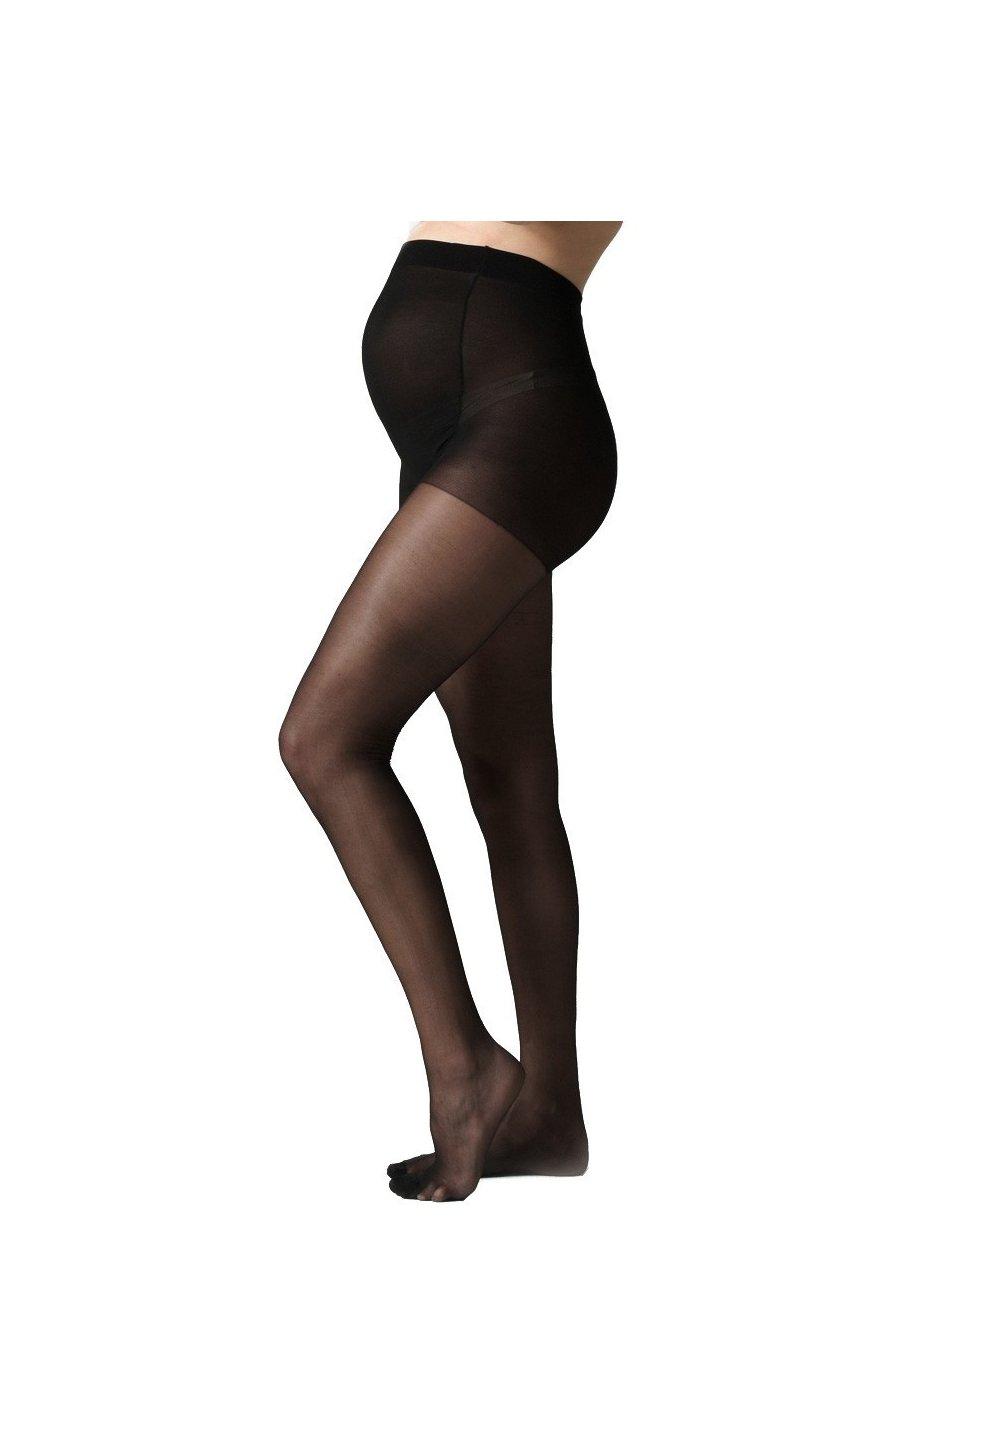 Ciorapi cu chilot gravide,negri, 40 Den imagine